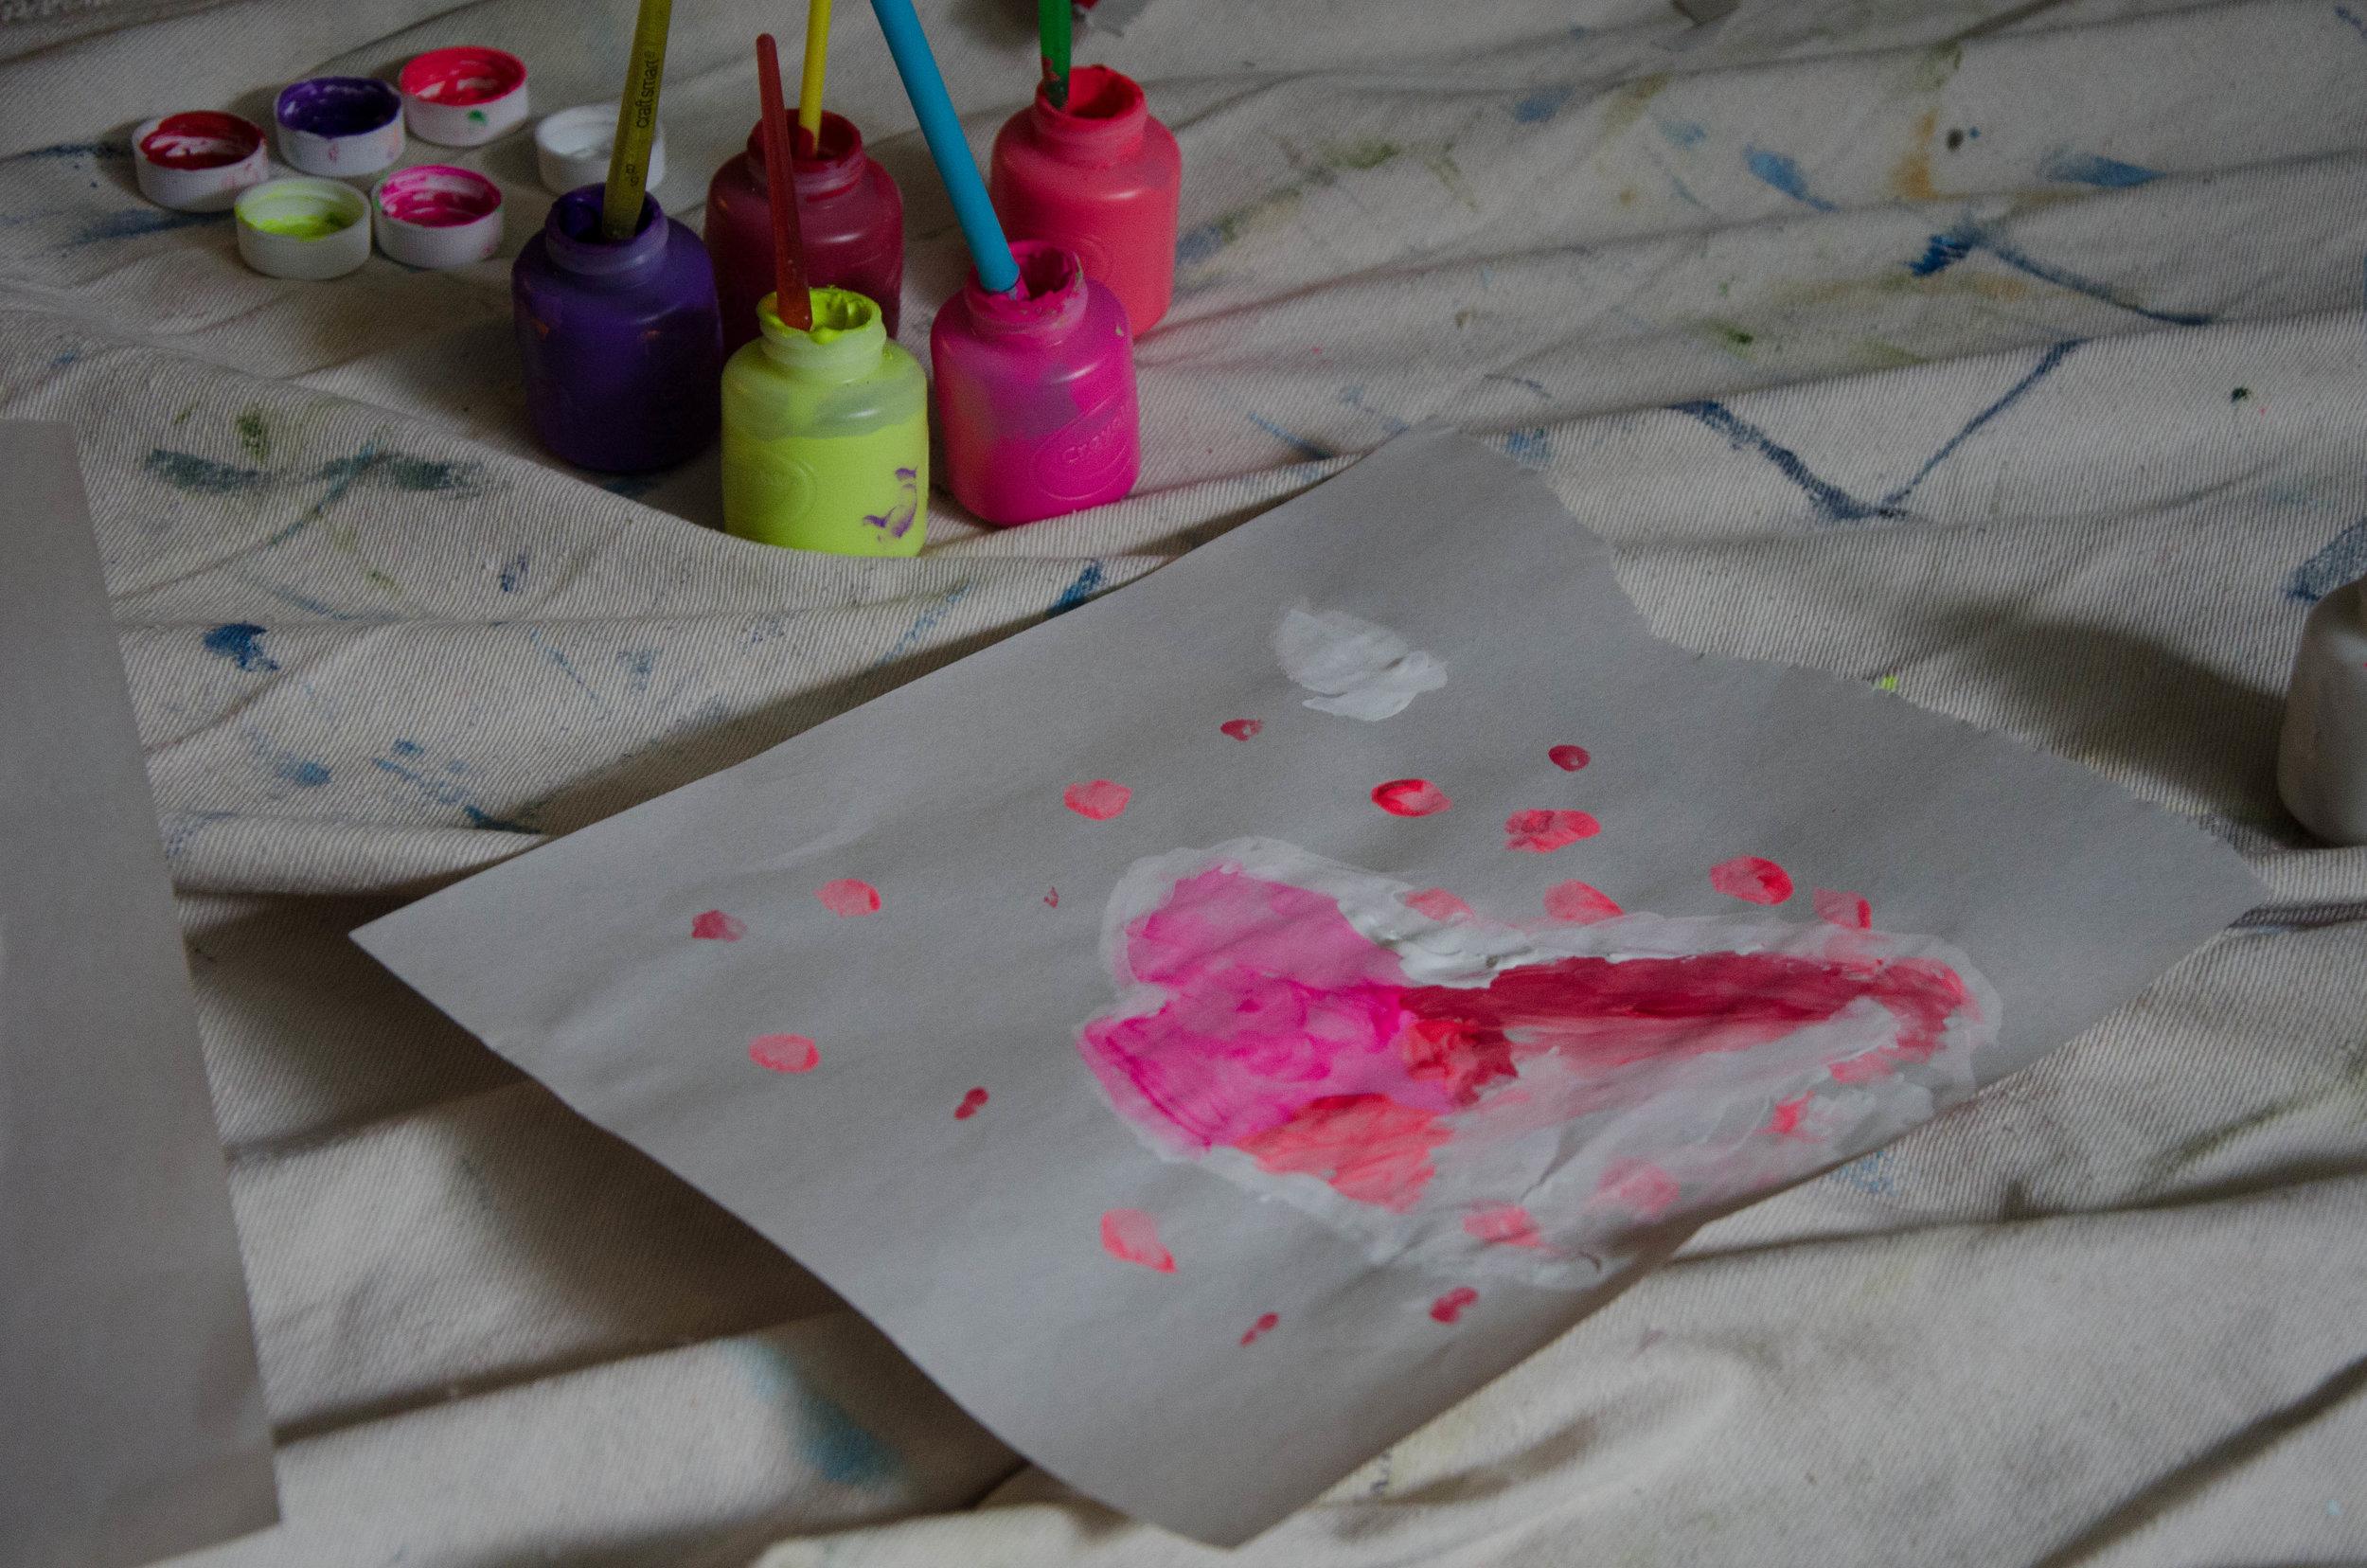 marysia-champ-art-studio-process-supplies-paint-brushes-canvas-creativity-and-kids-crayola-paints